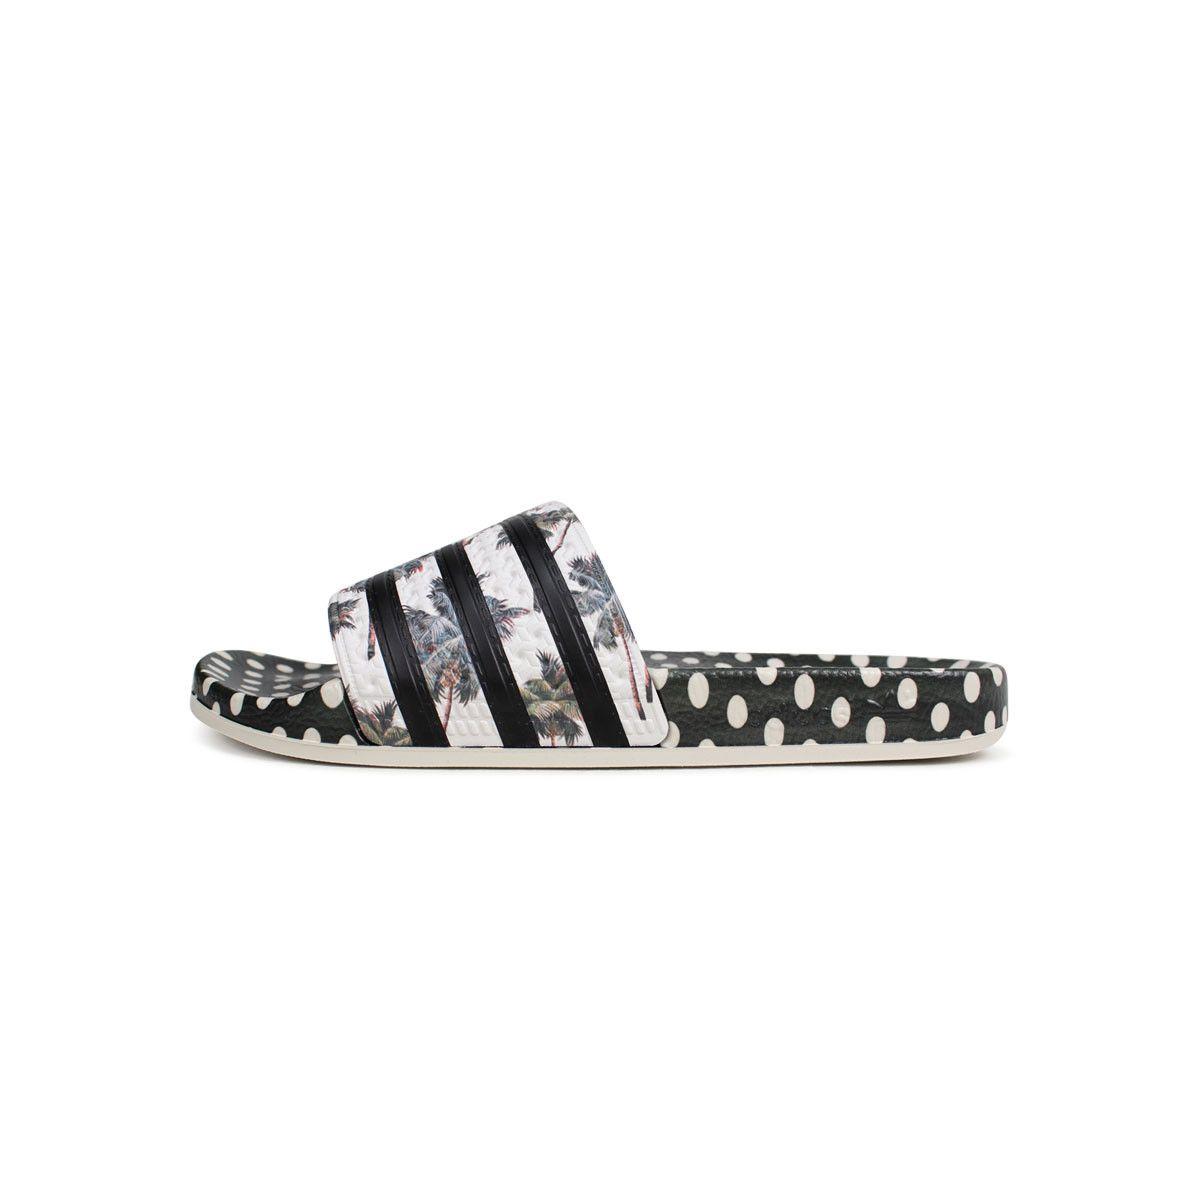 speical offer famous brand online here Sandale adidas Originals ADILETTE - Pegashoes